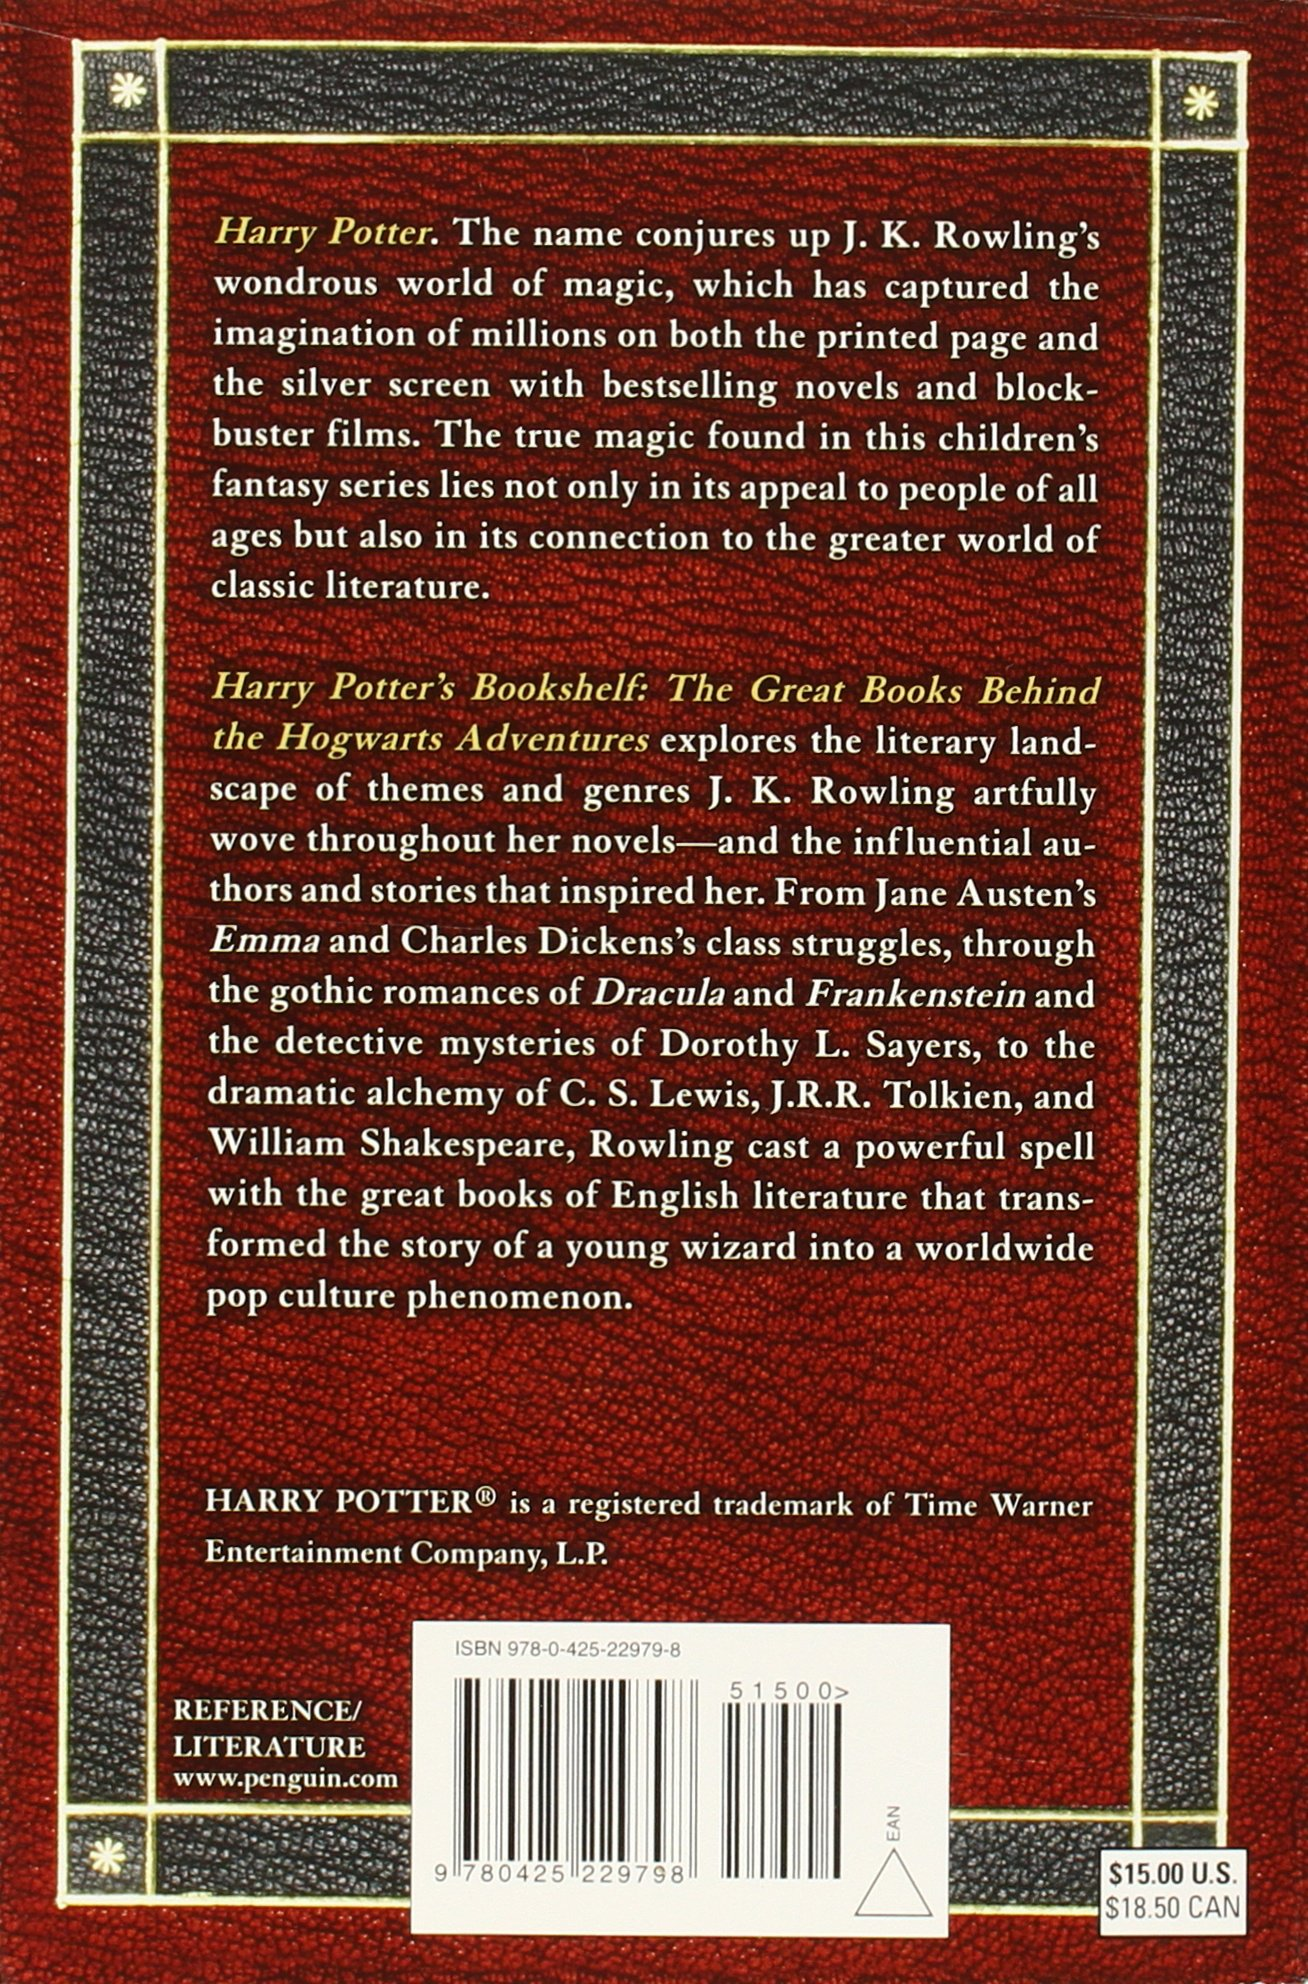 Amazon.com: Harry Potter's Bookshelf: The Great Books behind the Hogwarts  Adventures (9780425229798): John Granger: Books